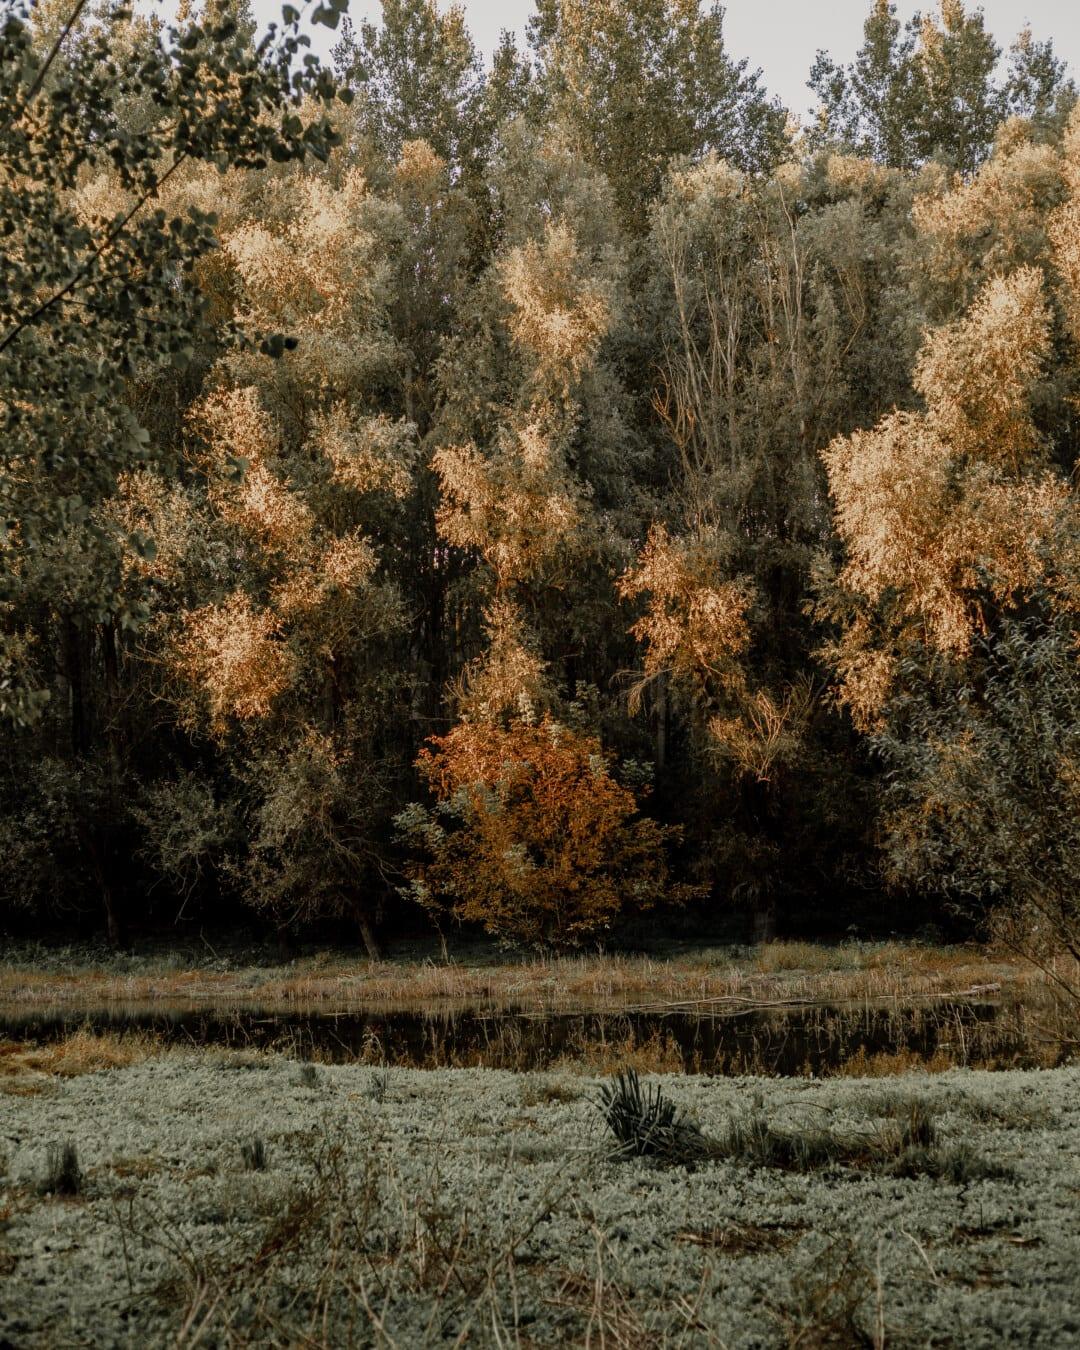 swamp, majestic, autumn season, forest, marshland, nature, dawn, landscape, wood, autumn